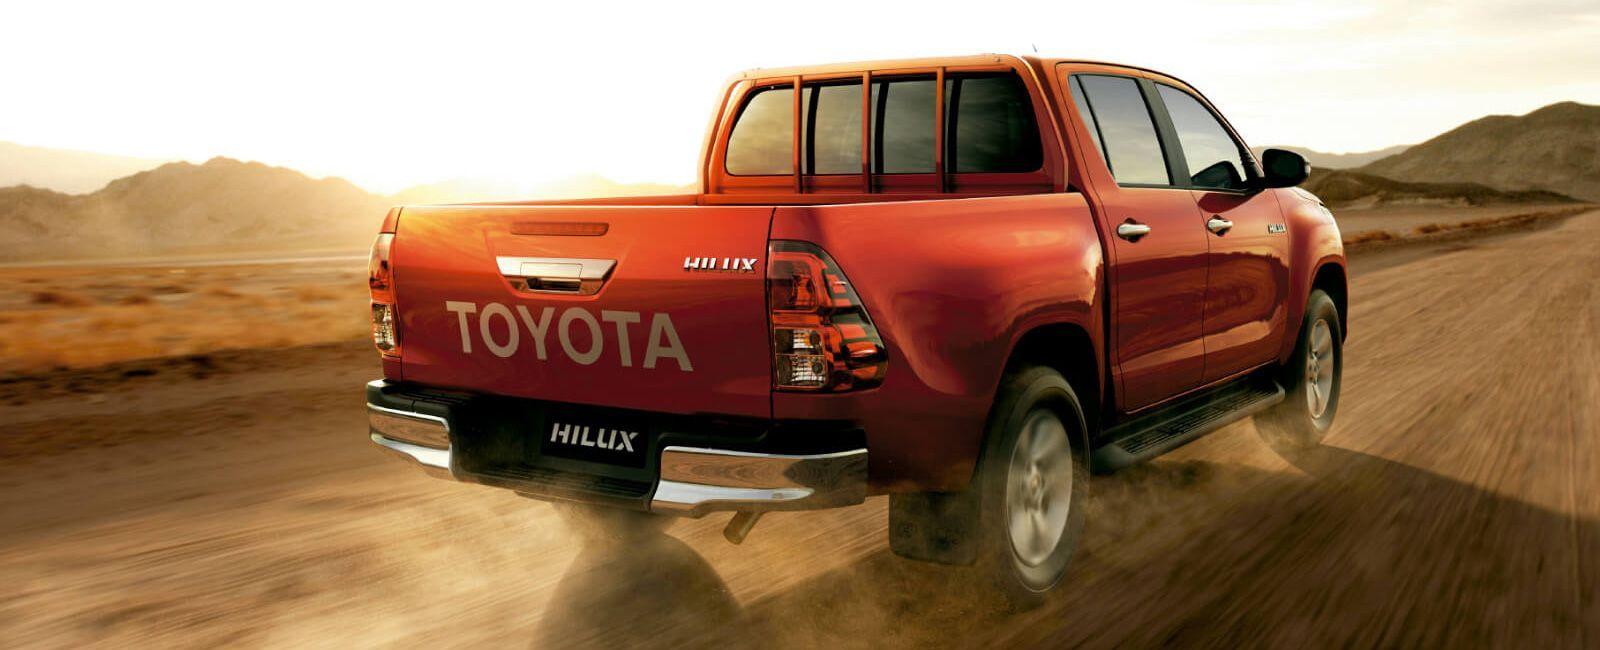 Camioneta Toyota Hilux para rentar